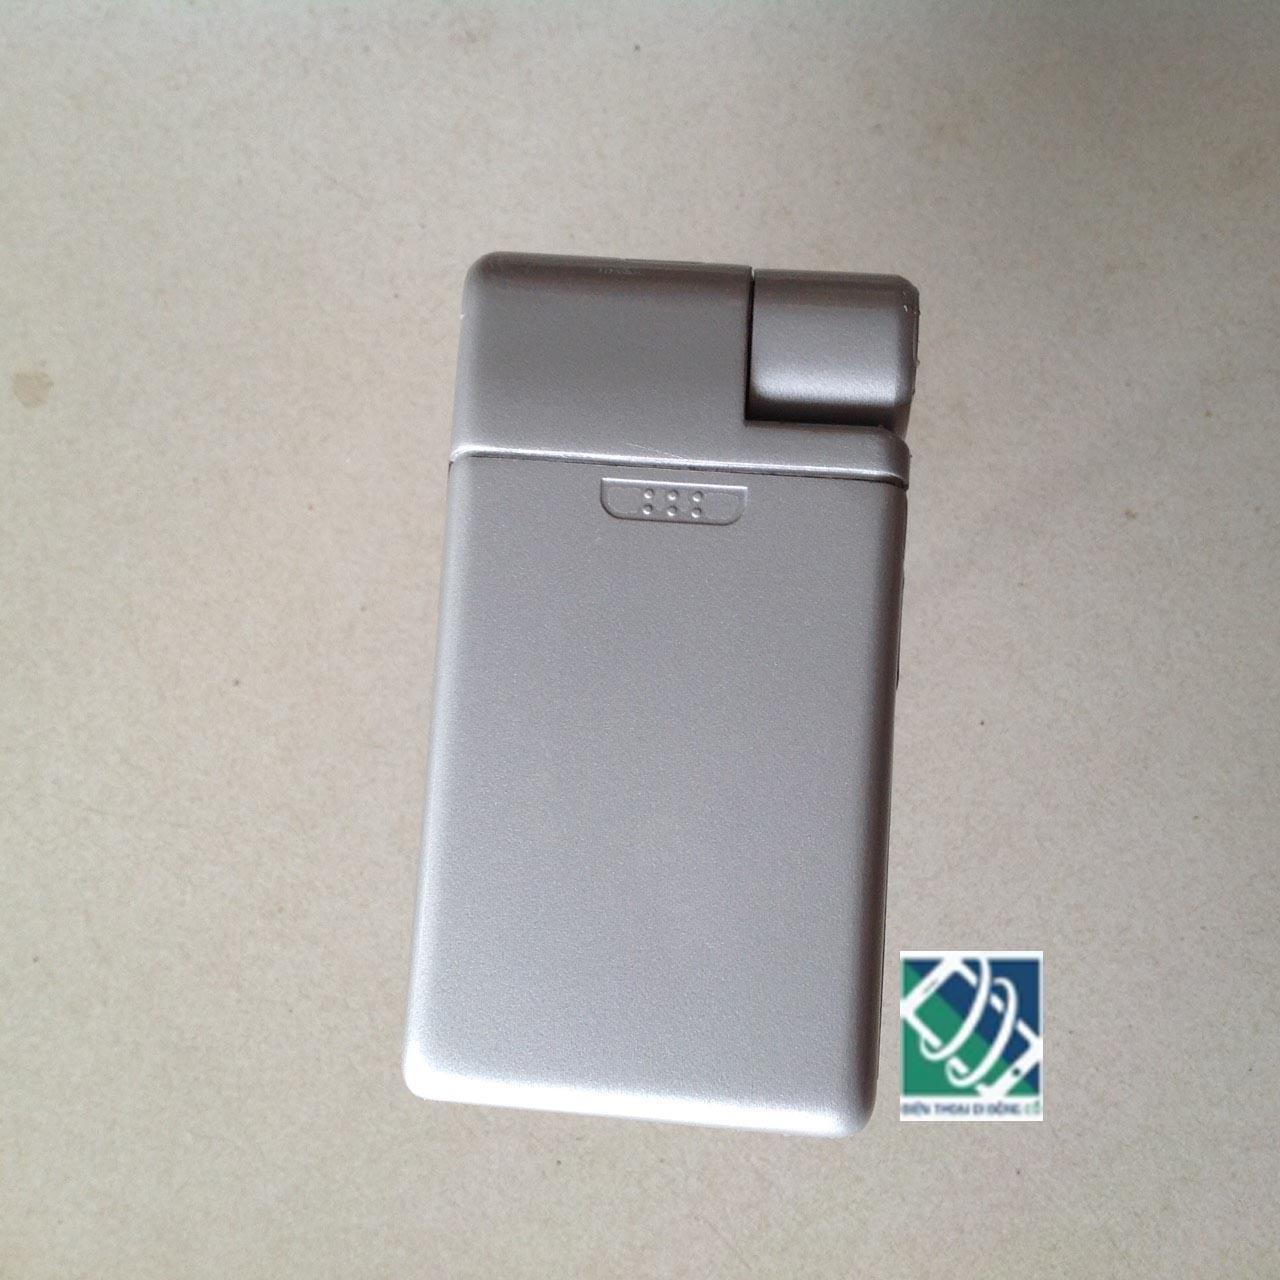 Điện Thoại Nokia N92